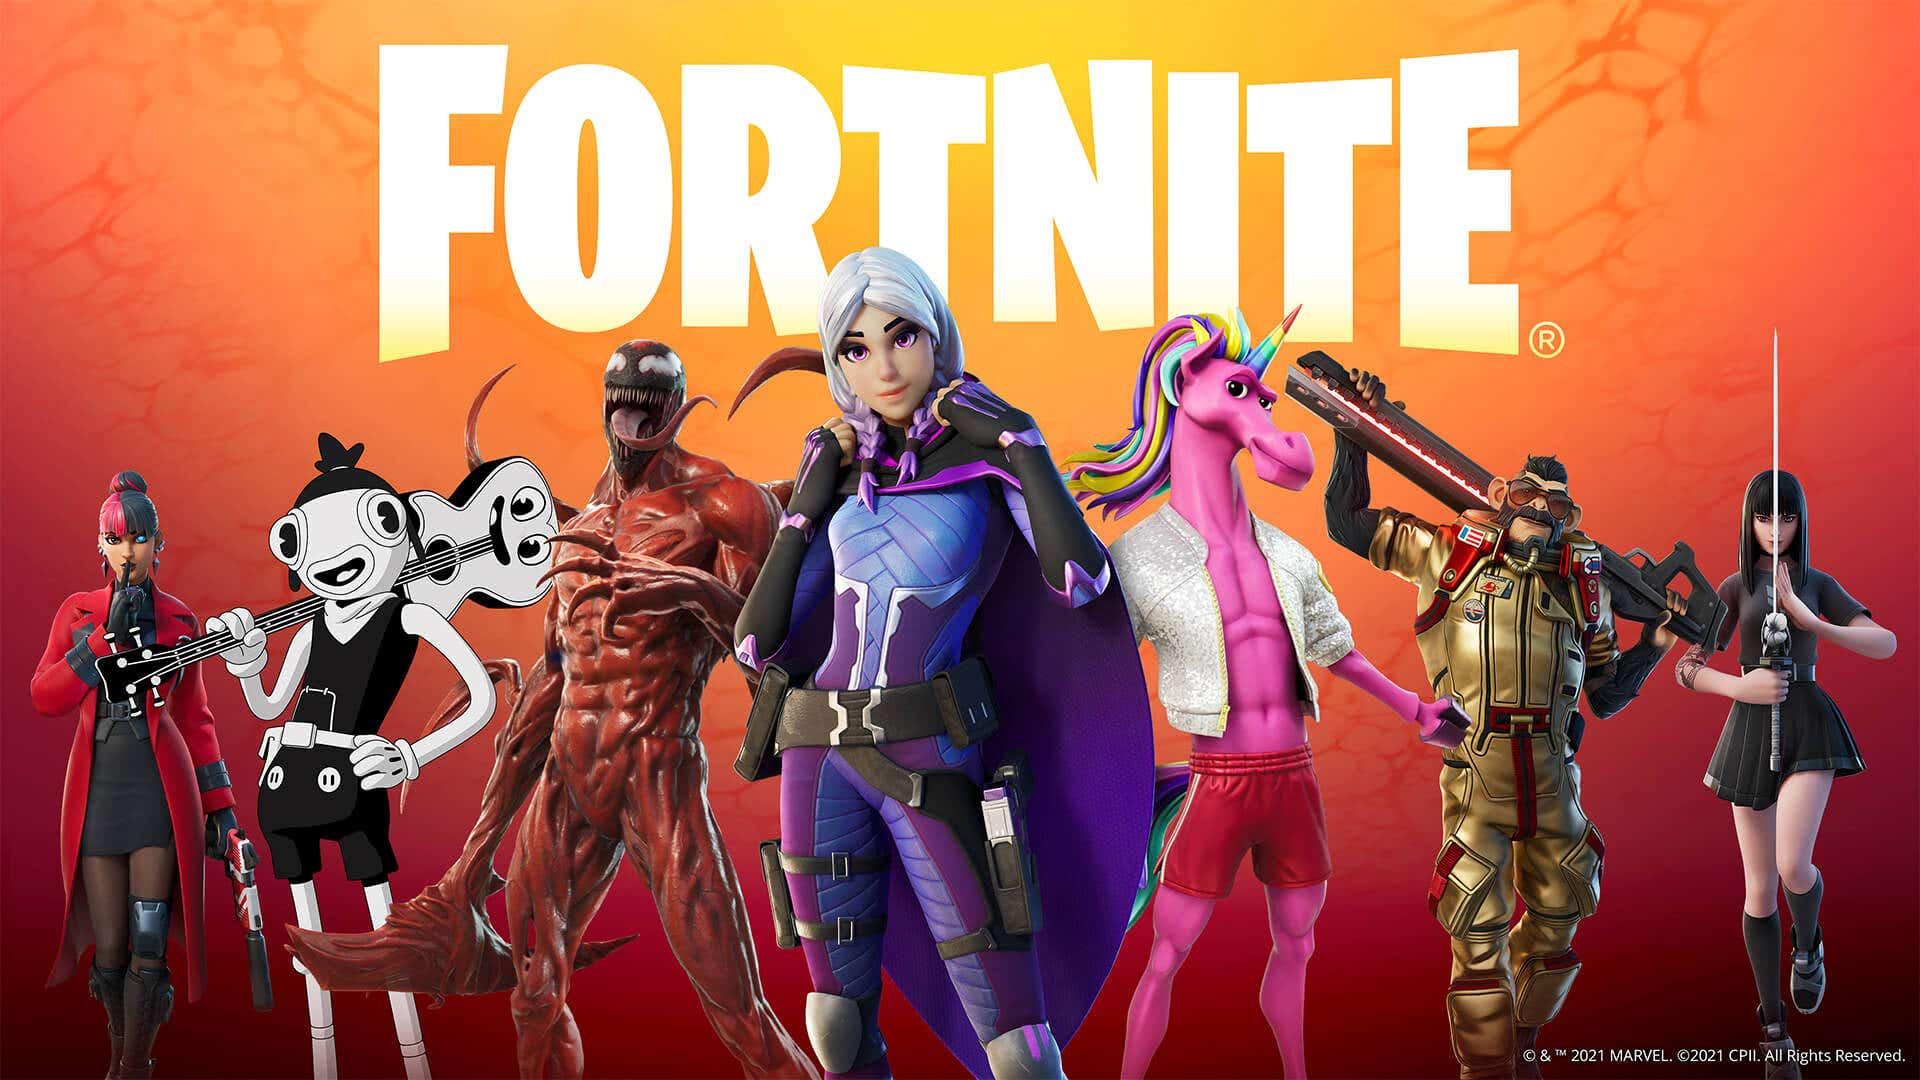 Fortnite game image